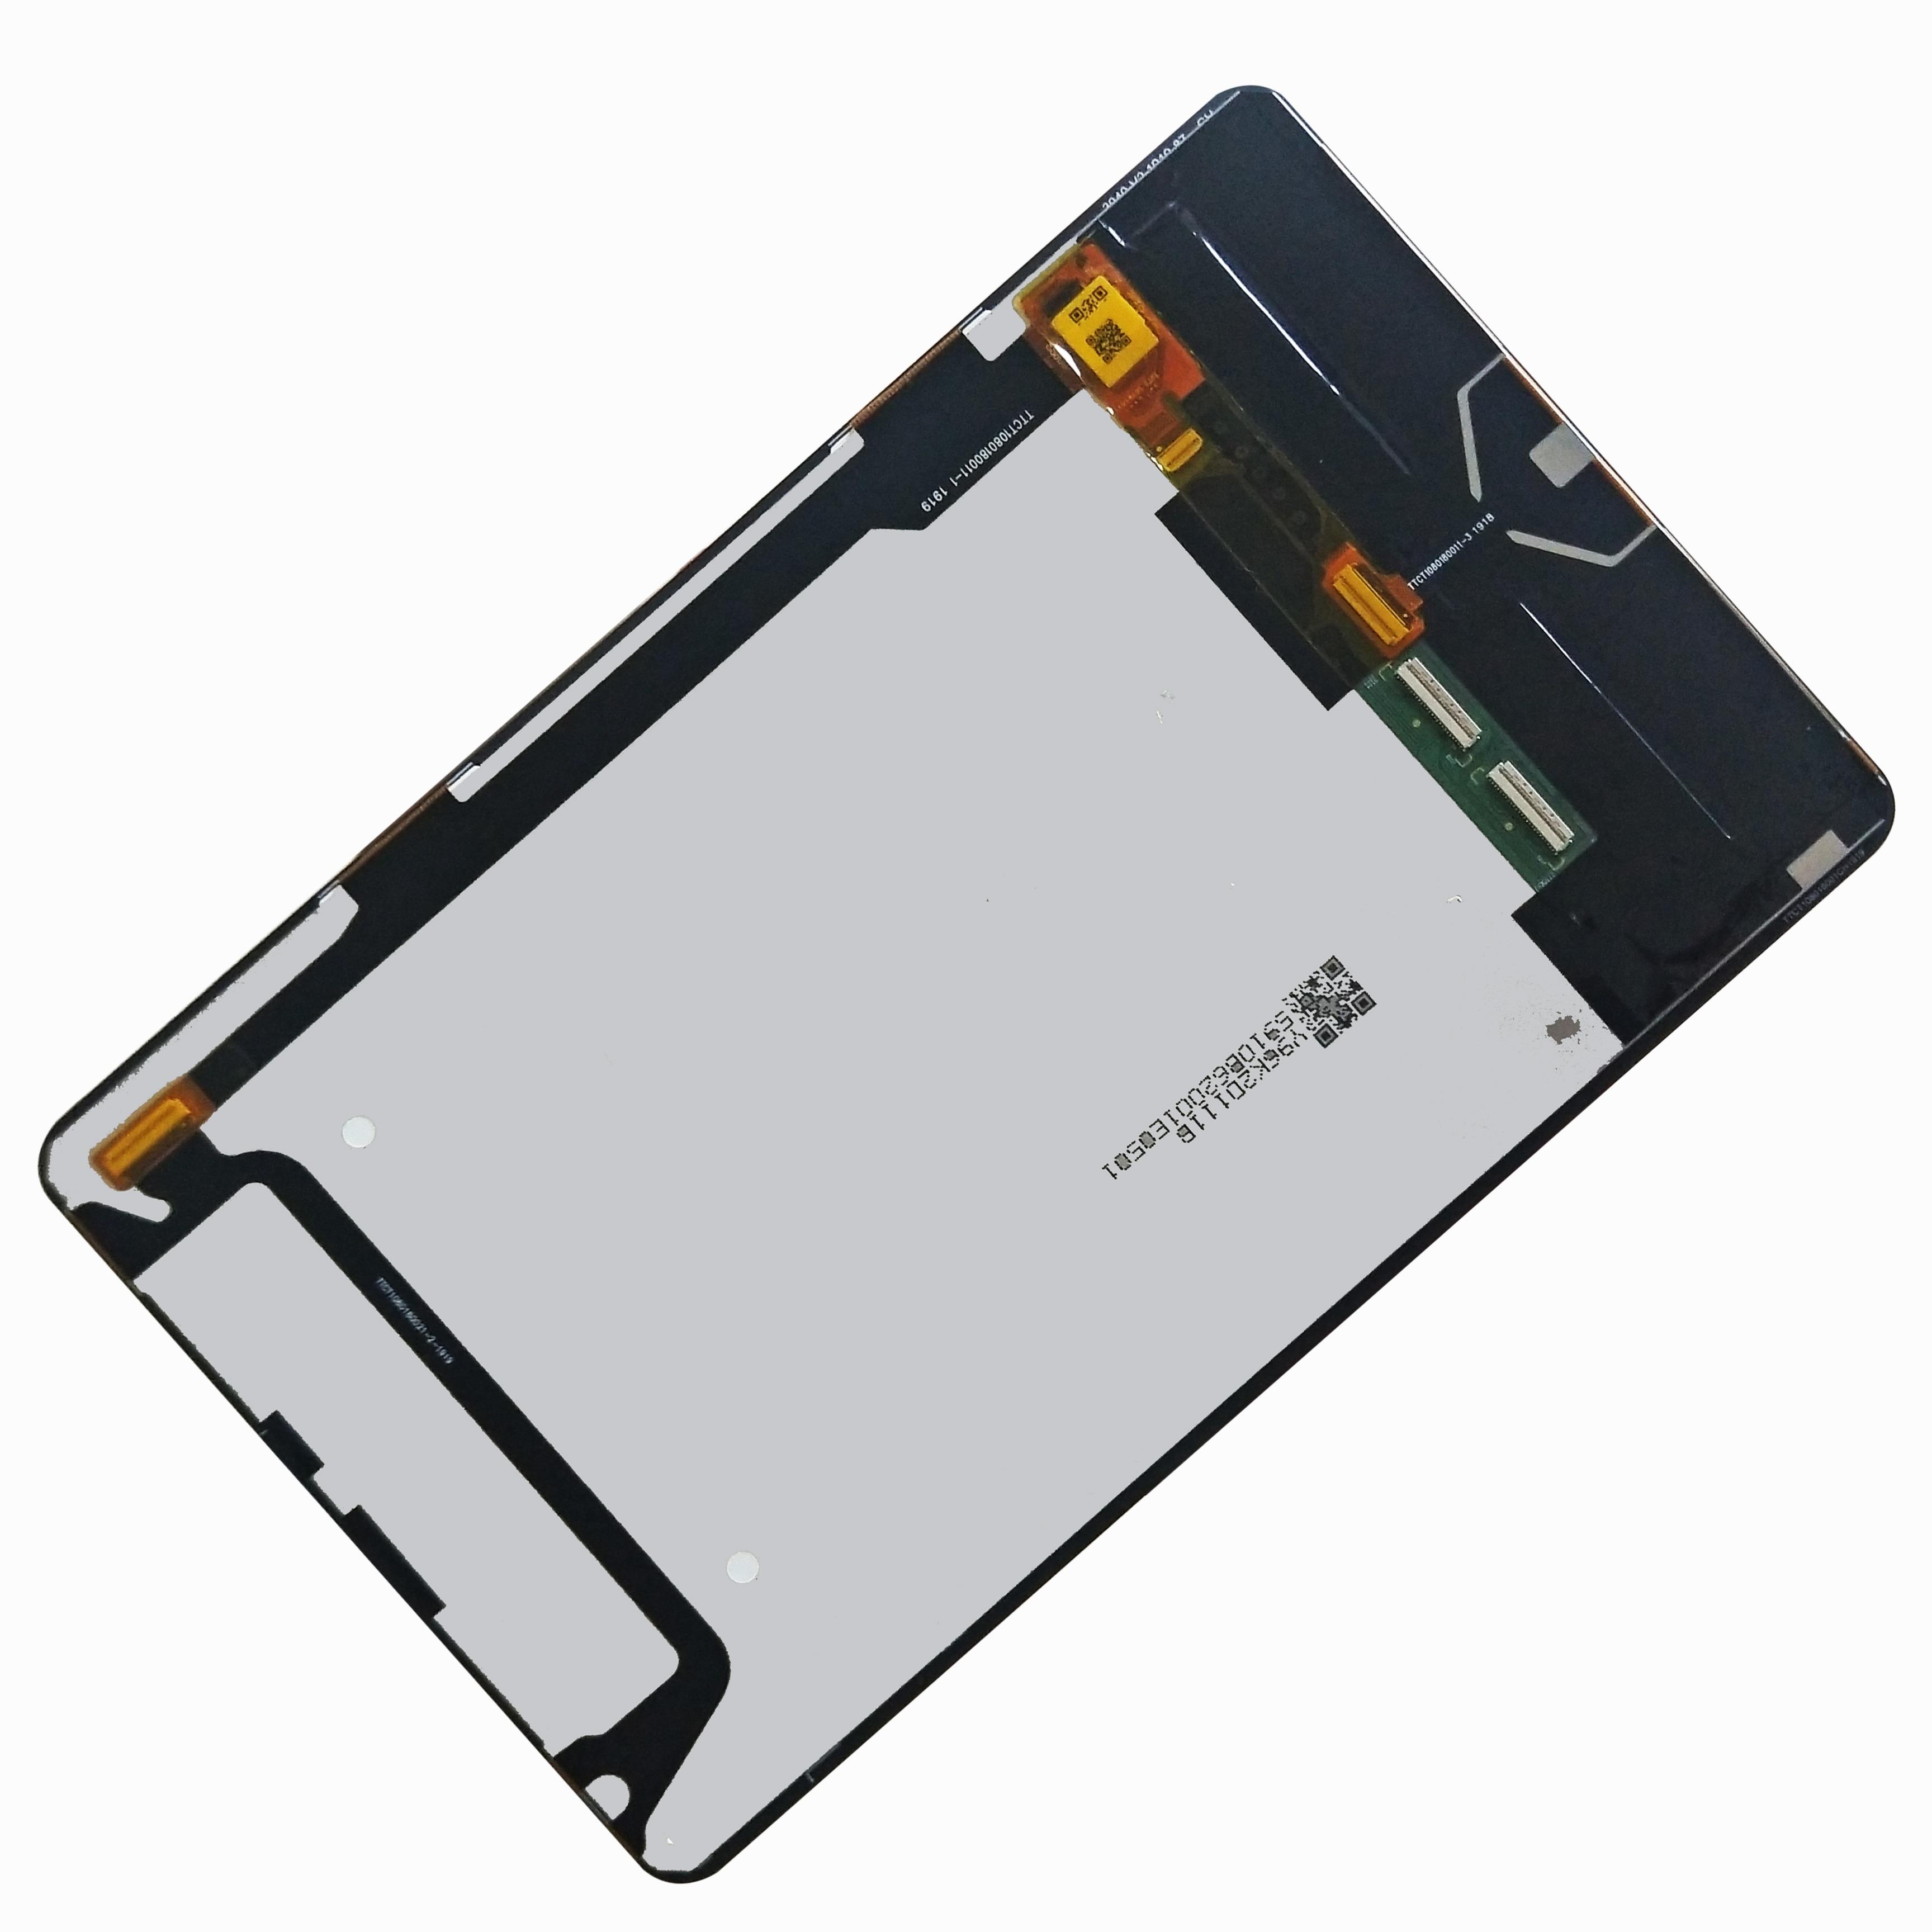 Originale 10.8 per Huawei Matepad Pro MRX W09 MRX W19 MRX AL19 MRX AL09 Display Lcd con Touch Screen Digitizer Assembly - 4